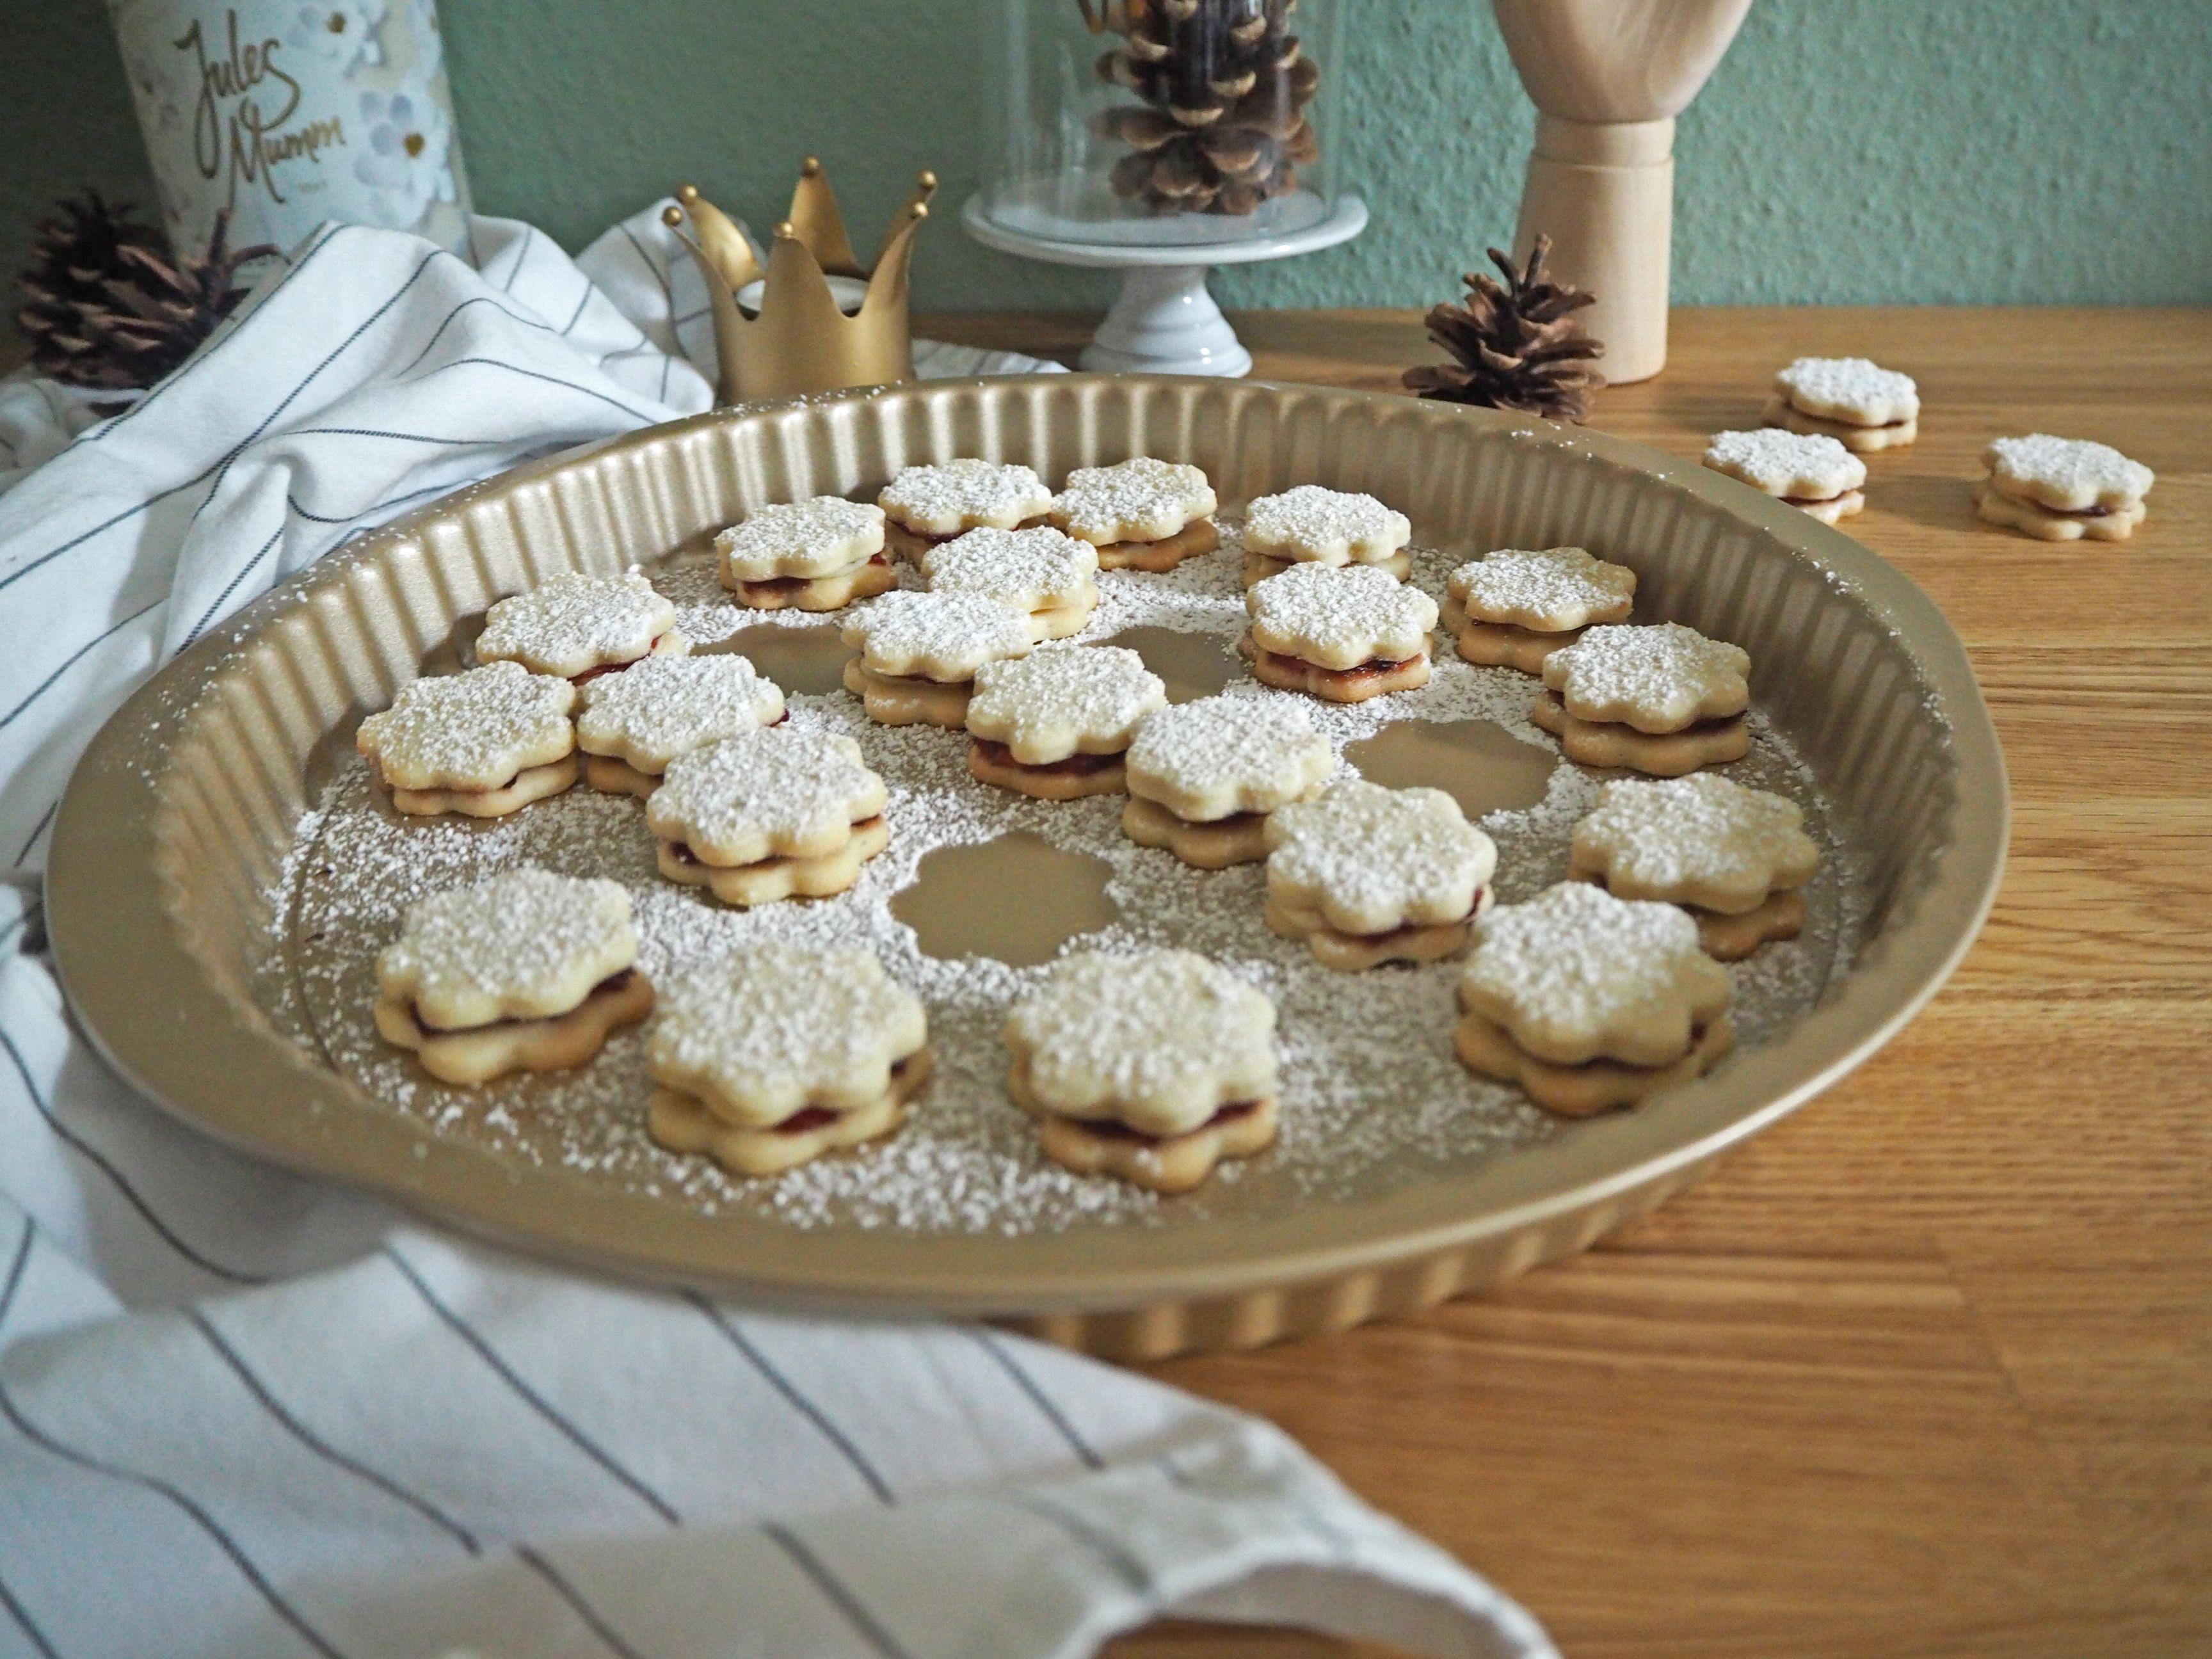 2018-skoen-och-kreativ-food-god-jul-plaetzchen-vanille-cookies-mit-marmelade (7)